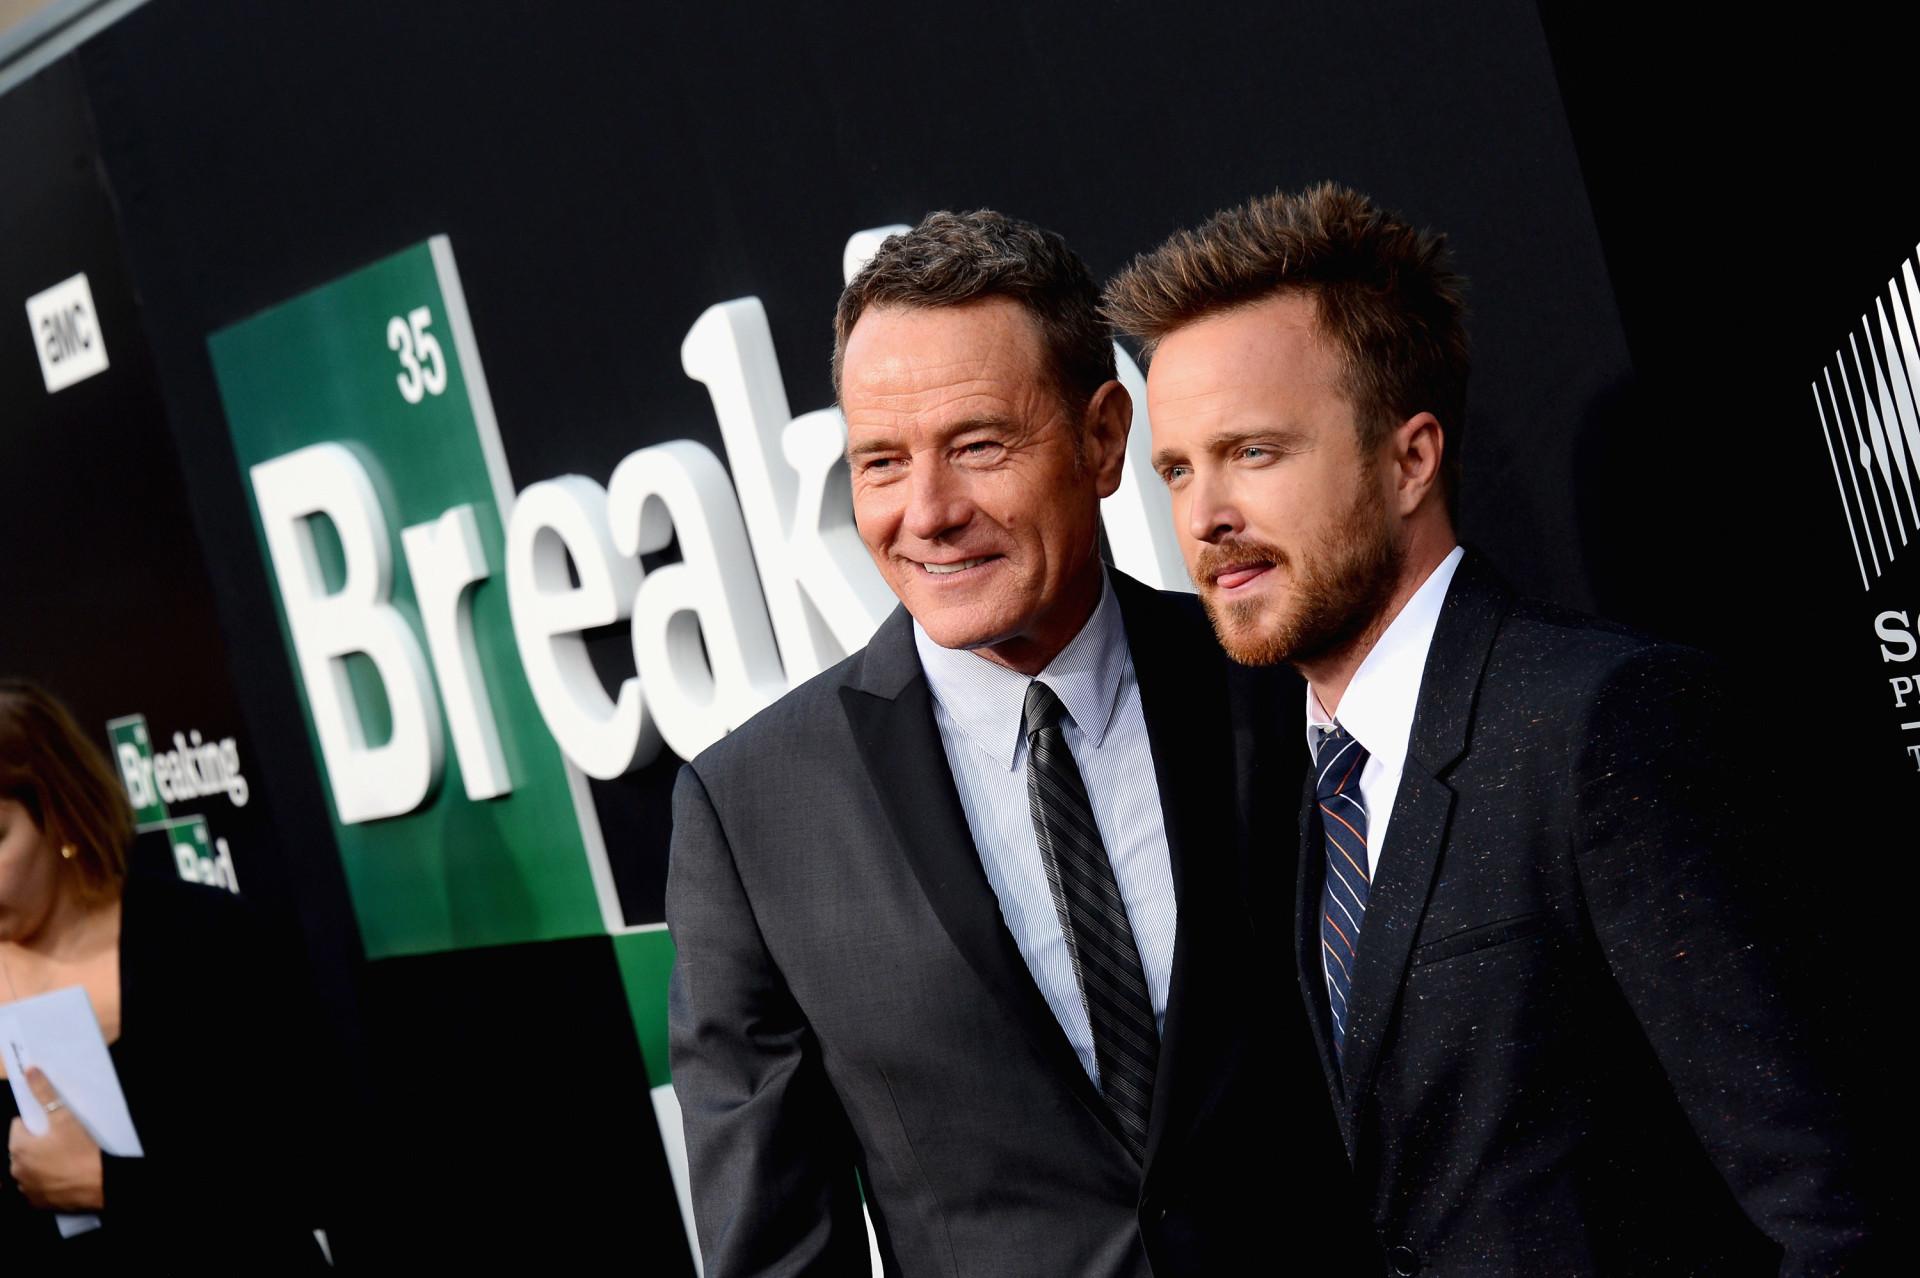 'Breaking Bad' vai virar filme! Veja fatos curiosos sobre a série